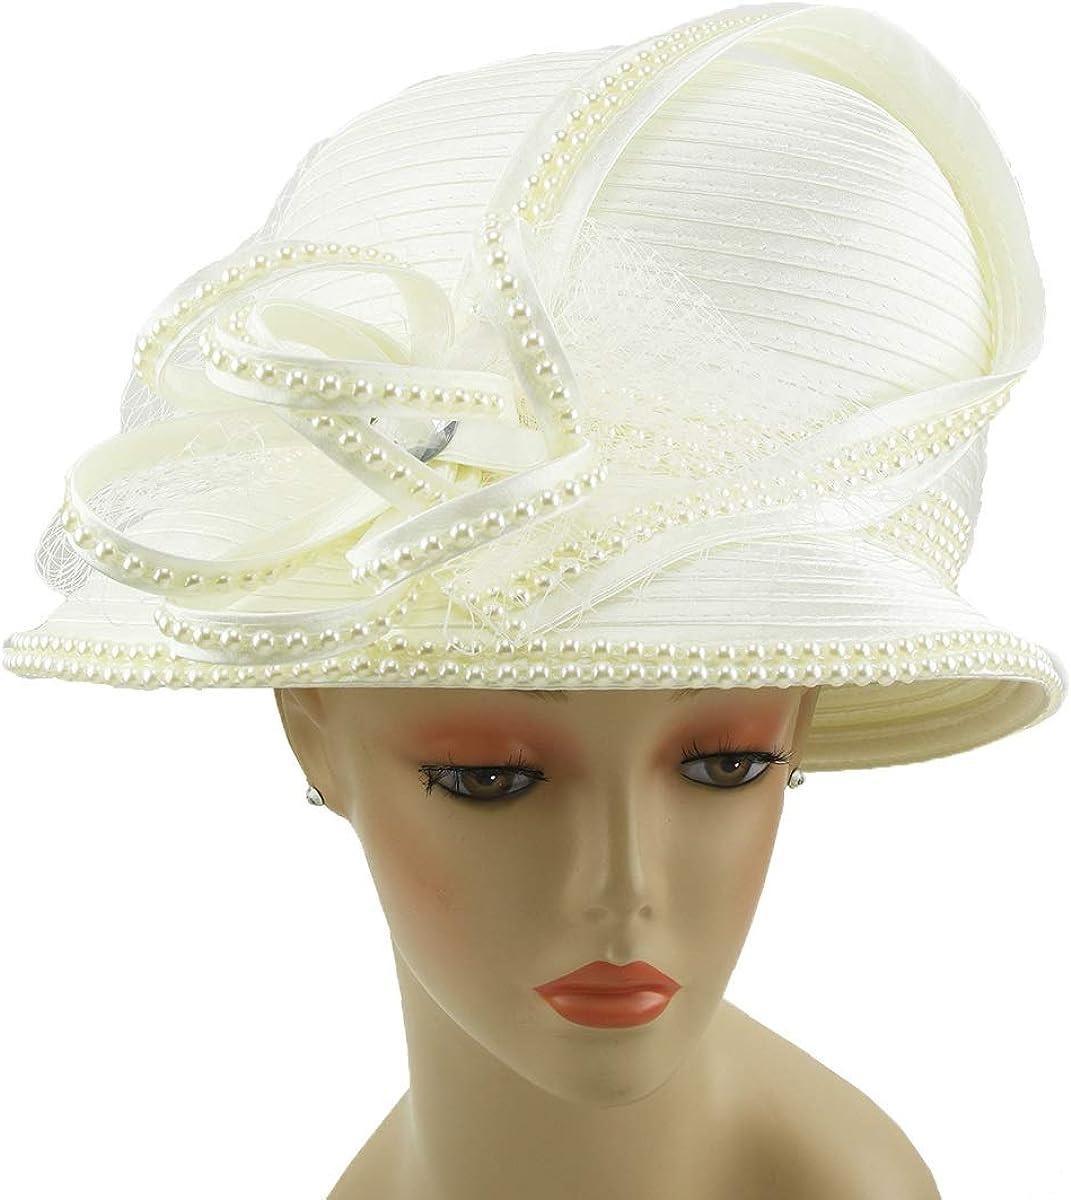 Janes Hat Janes Women Hat Church Hats Wedding Tea Party Formal Hats